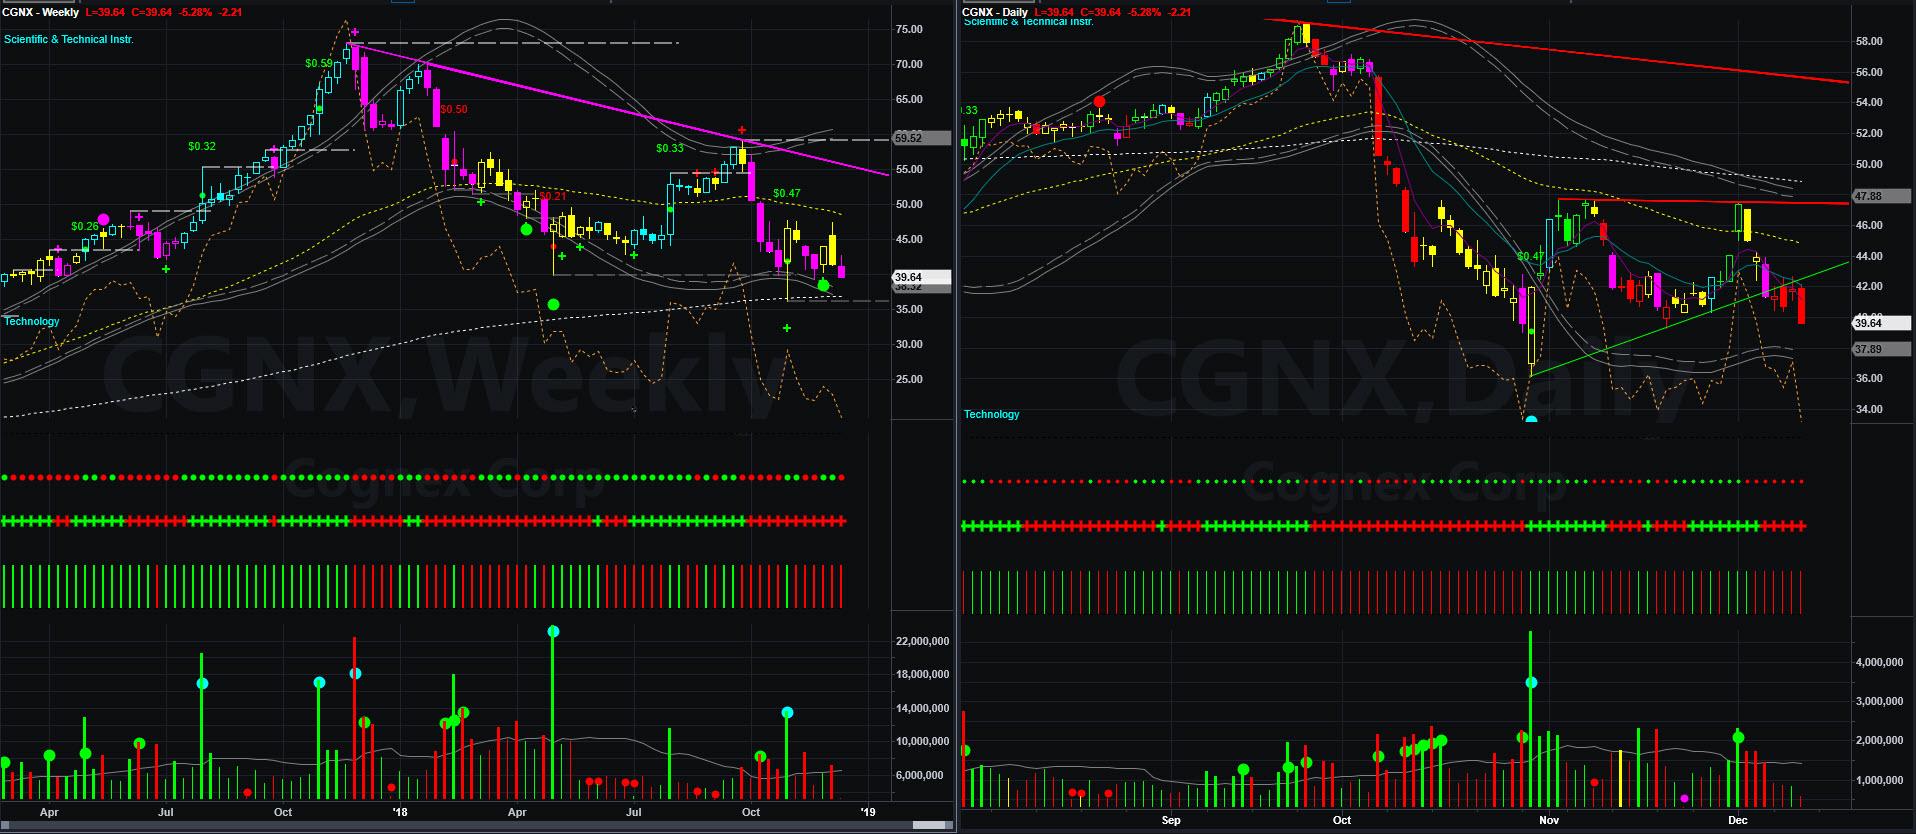 CGNX Chart 2018-12-13_14-06-17.jpg